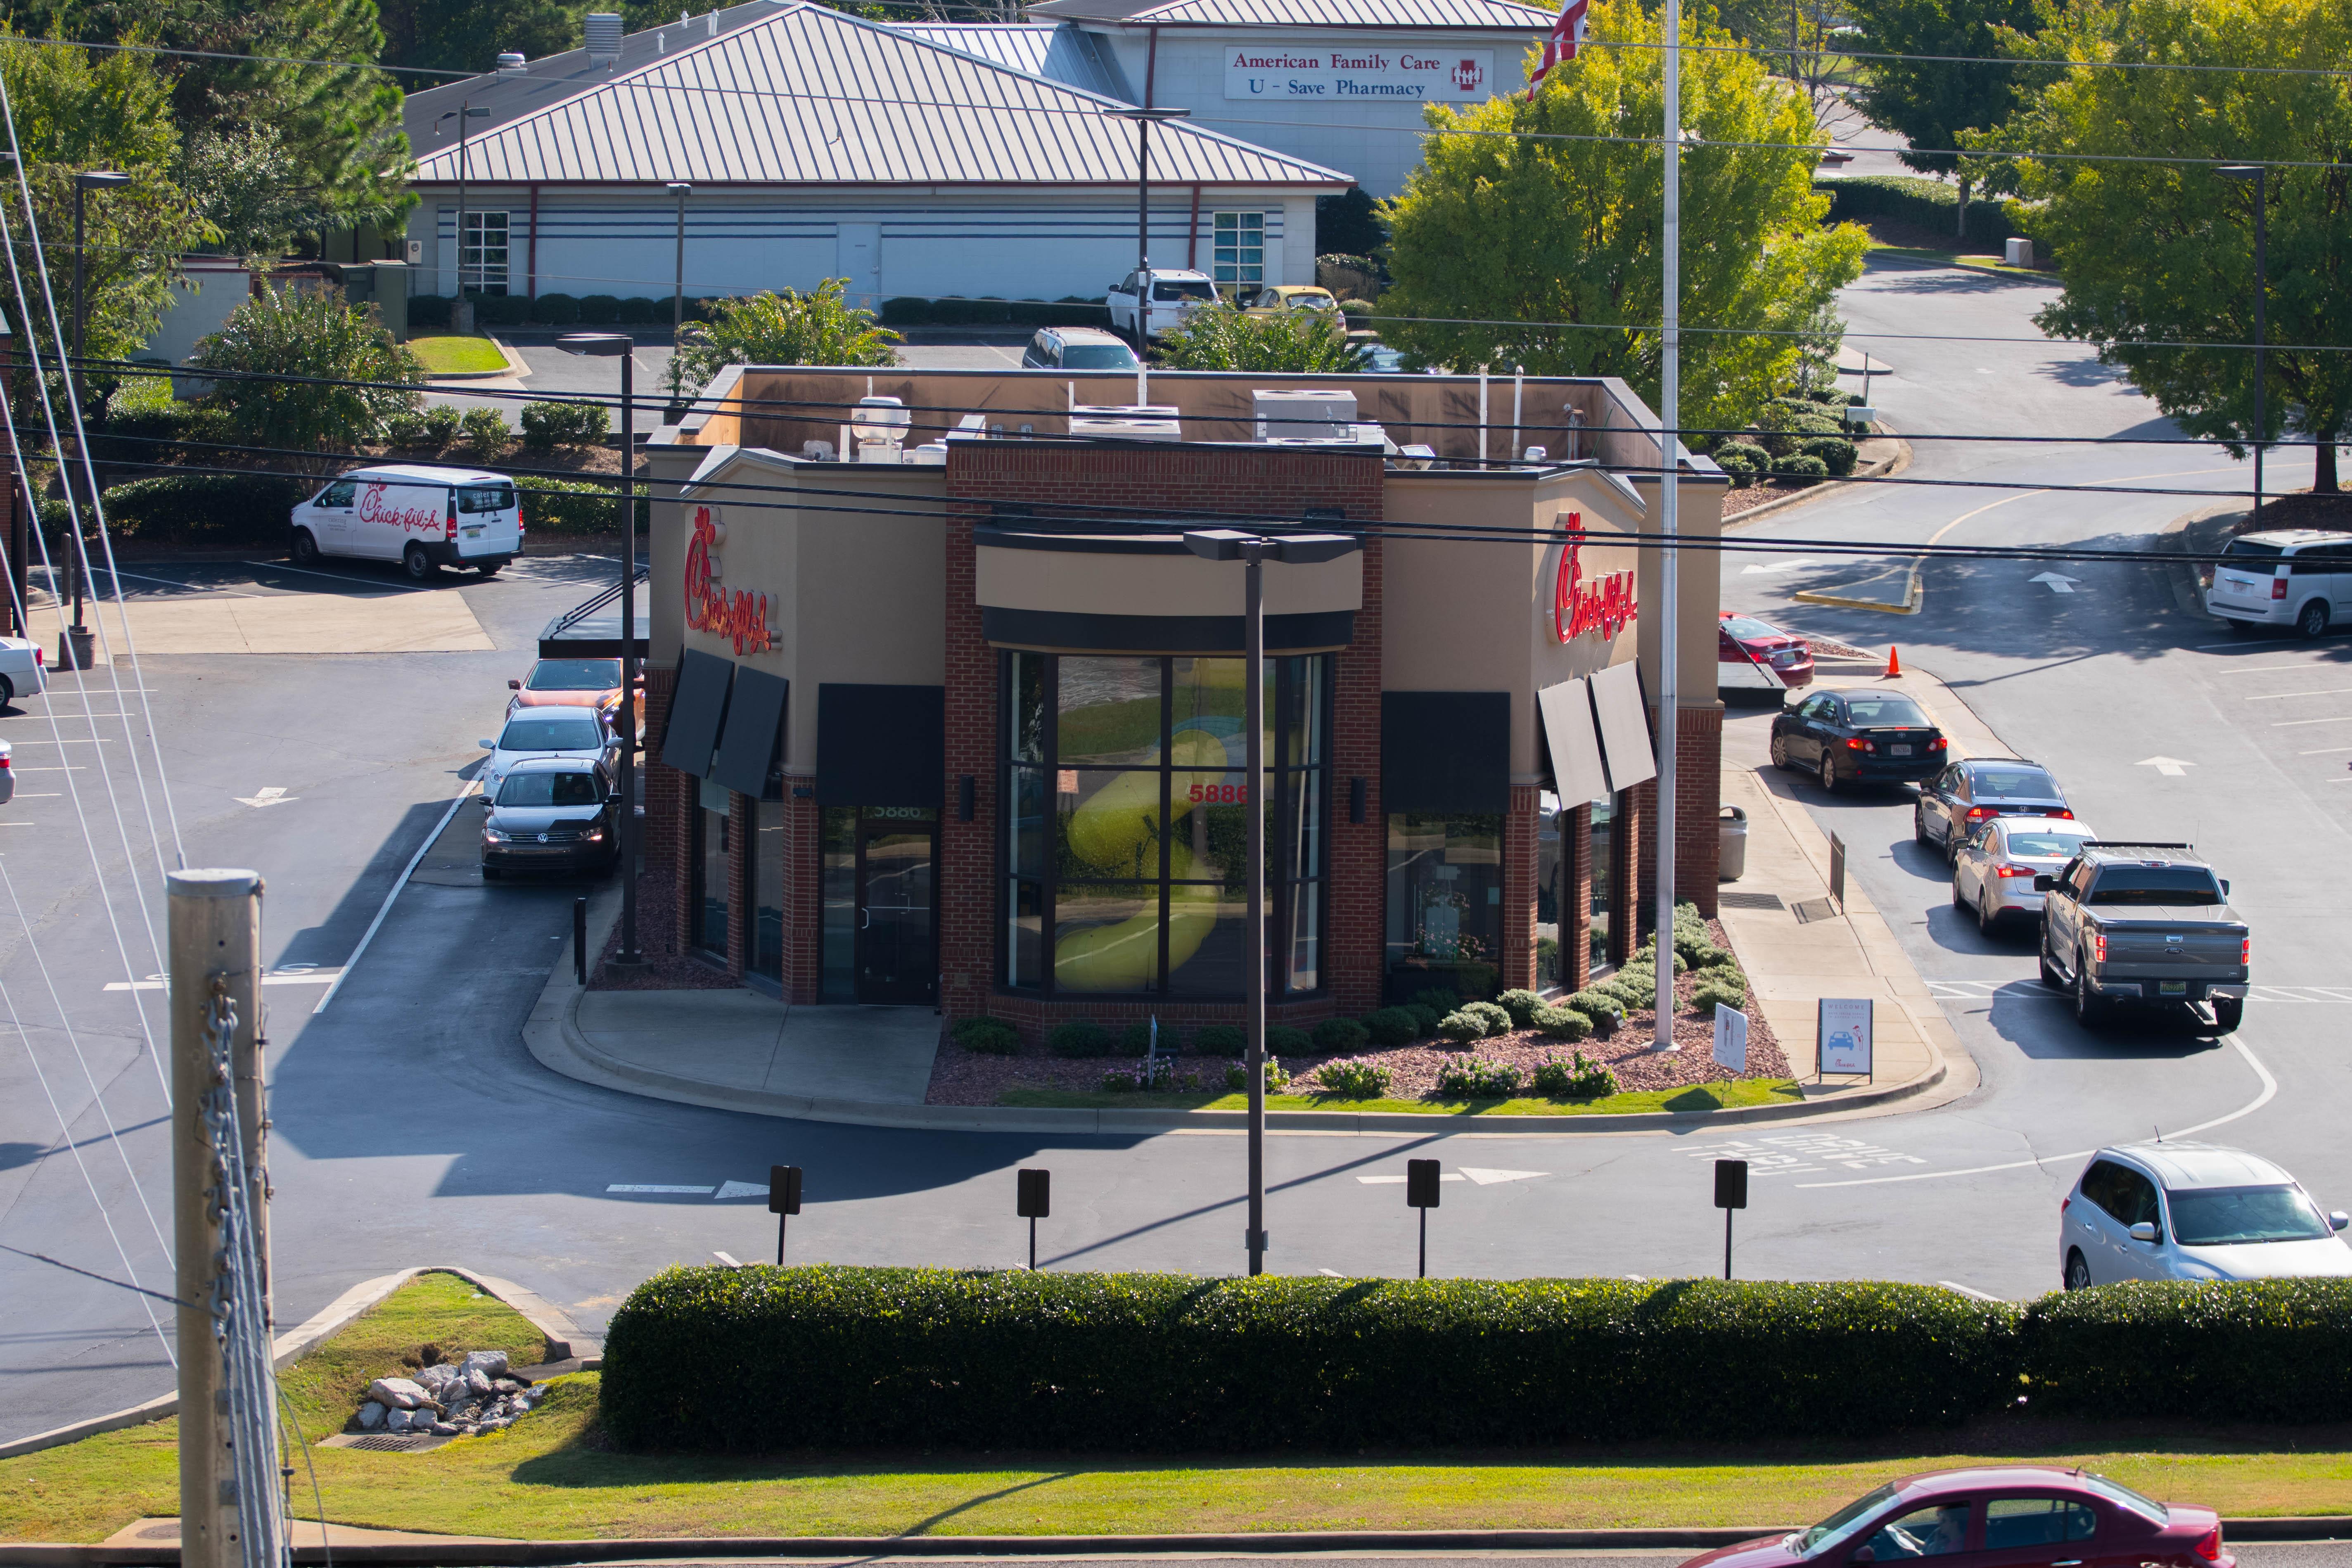 Trussville Chick-fil-A plans kitchen expansion, drive-thru upgrades